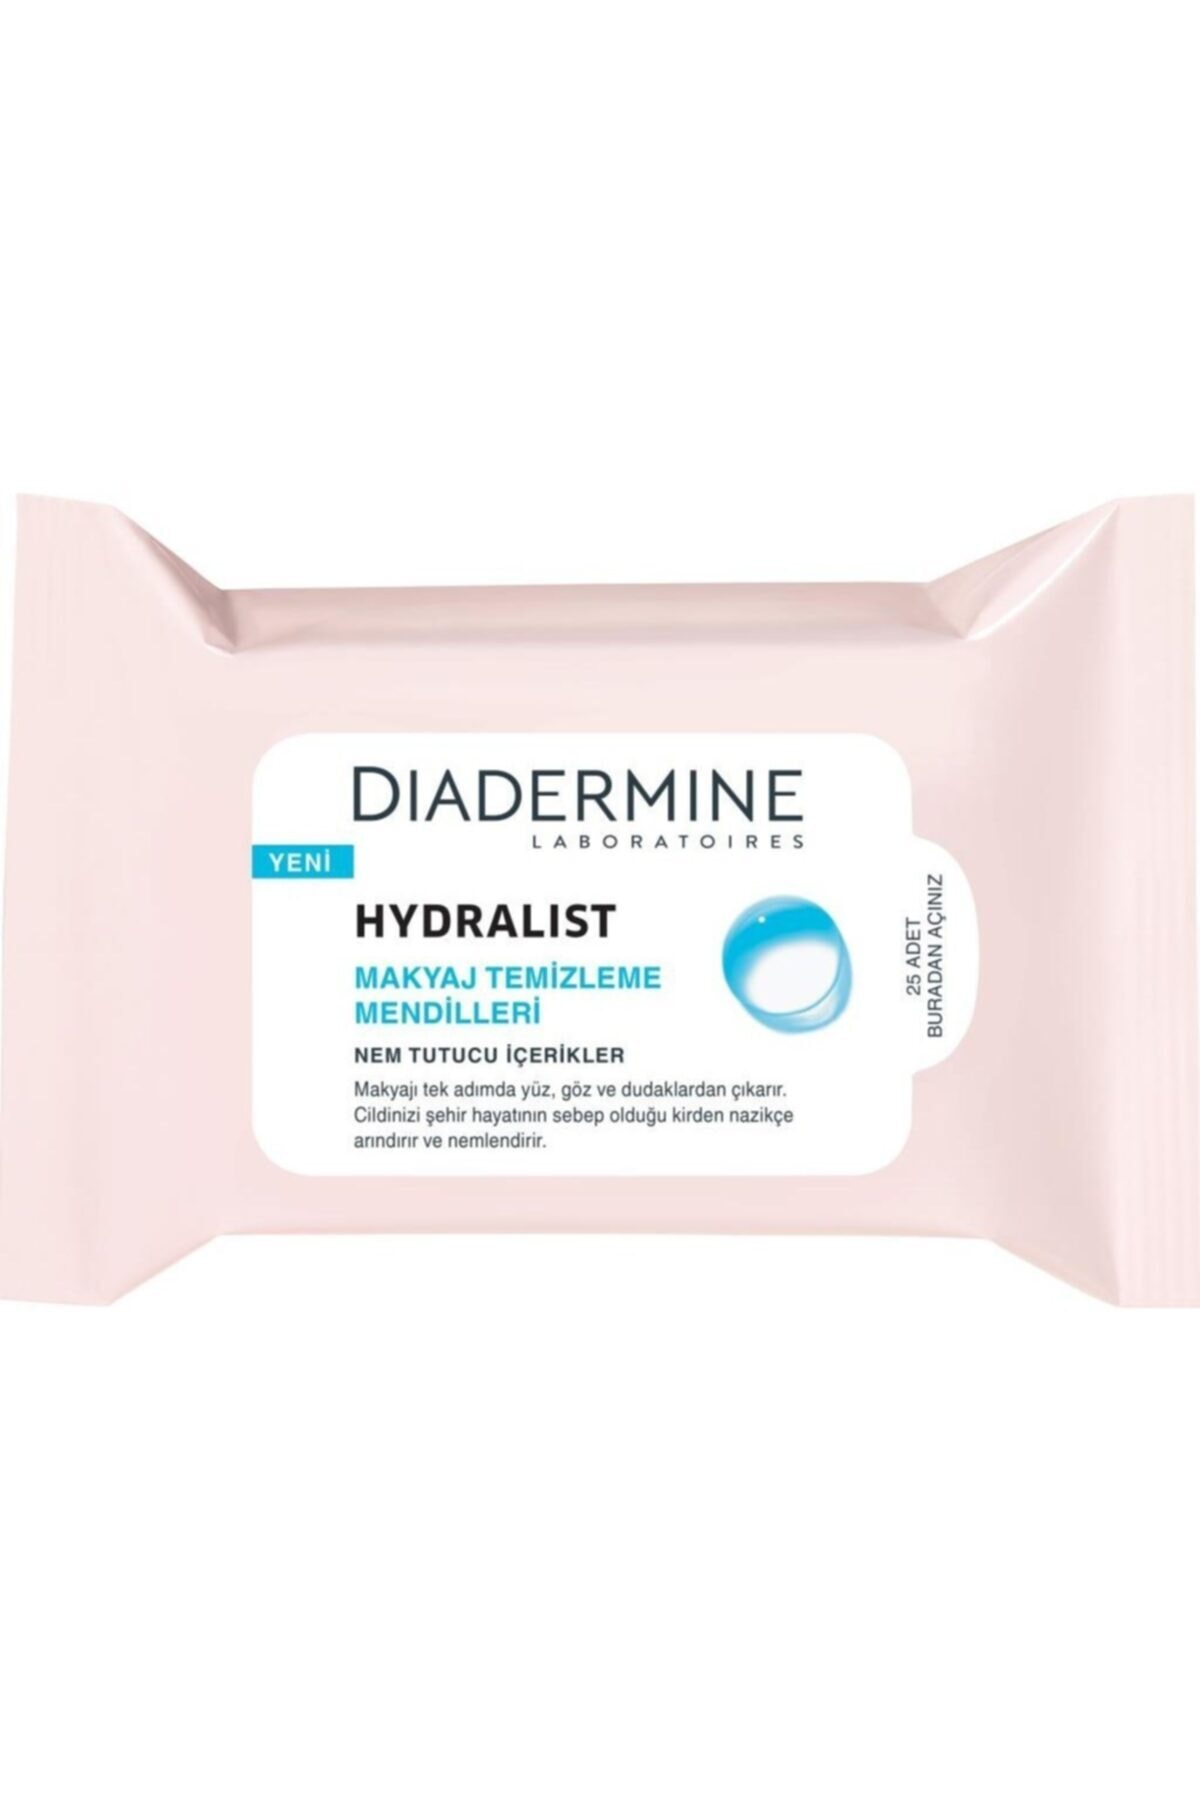 Diadermine Hydralist Makyaj Temizleme Mendilleri 1